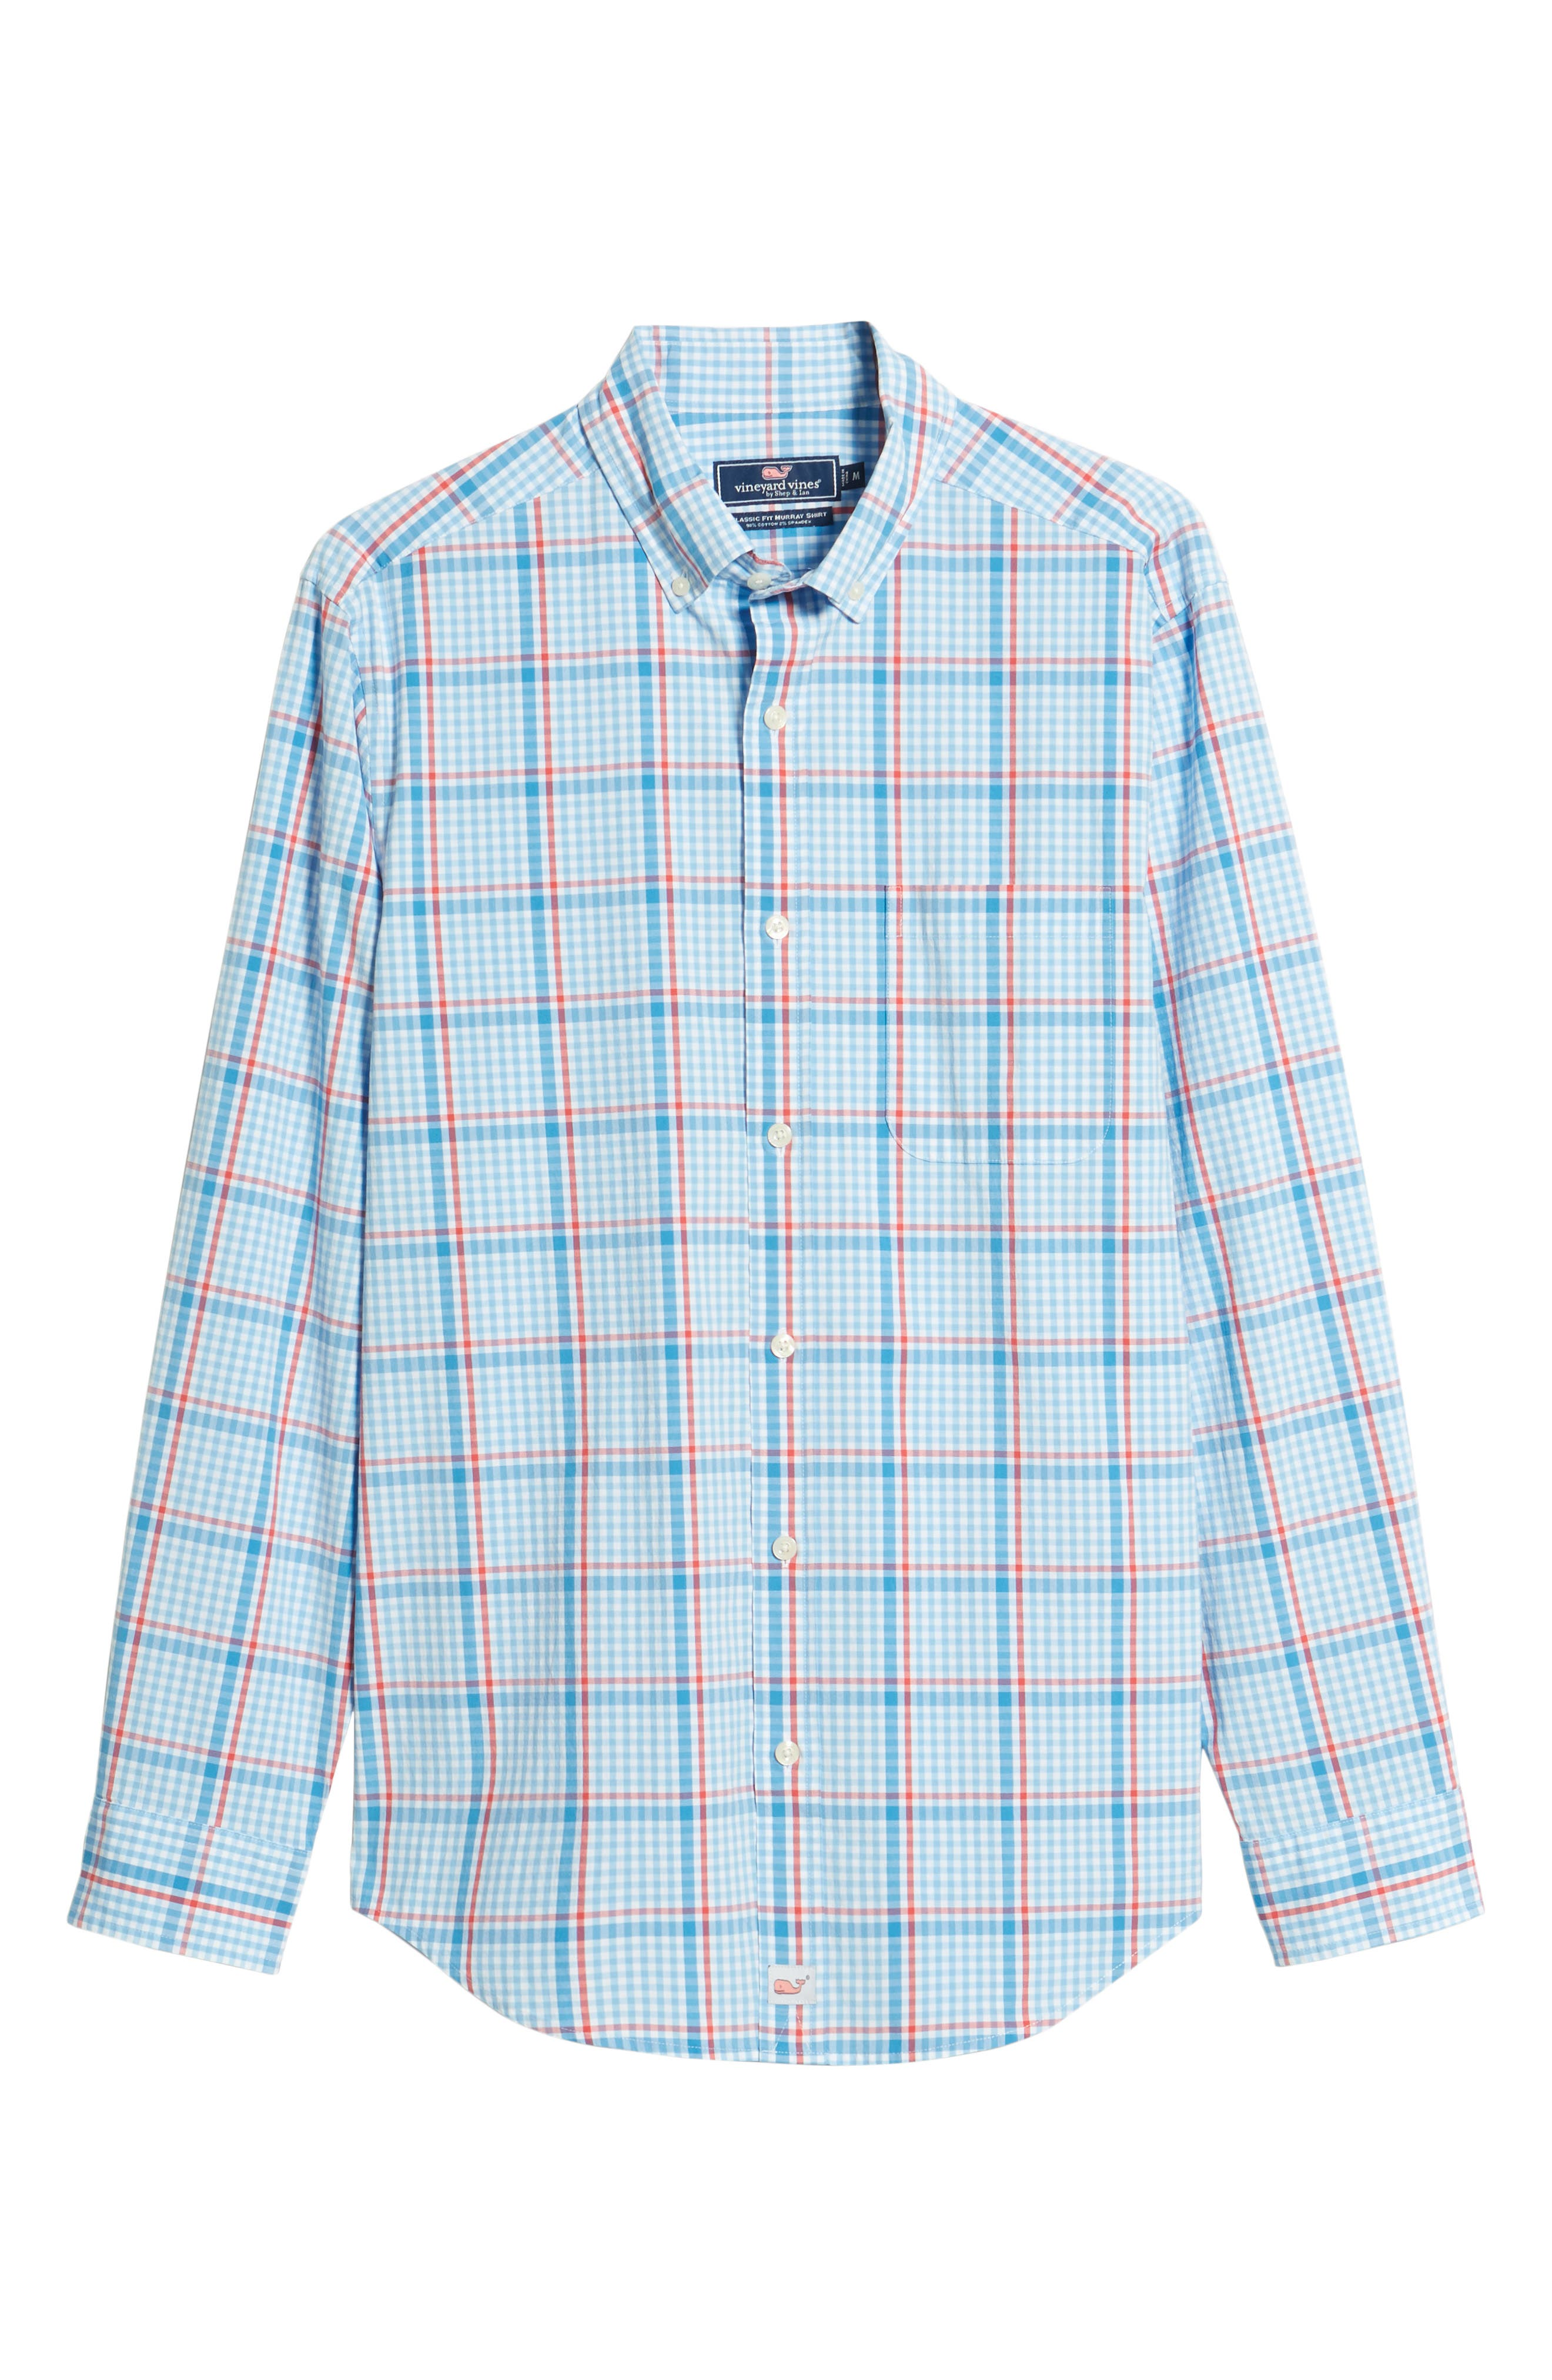 Palmer Island Classic Fit Plaid Sport Shirt,                             Alternate thumbnail 6, color,                             484